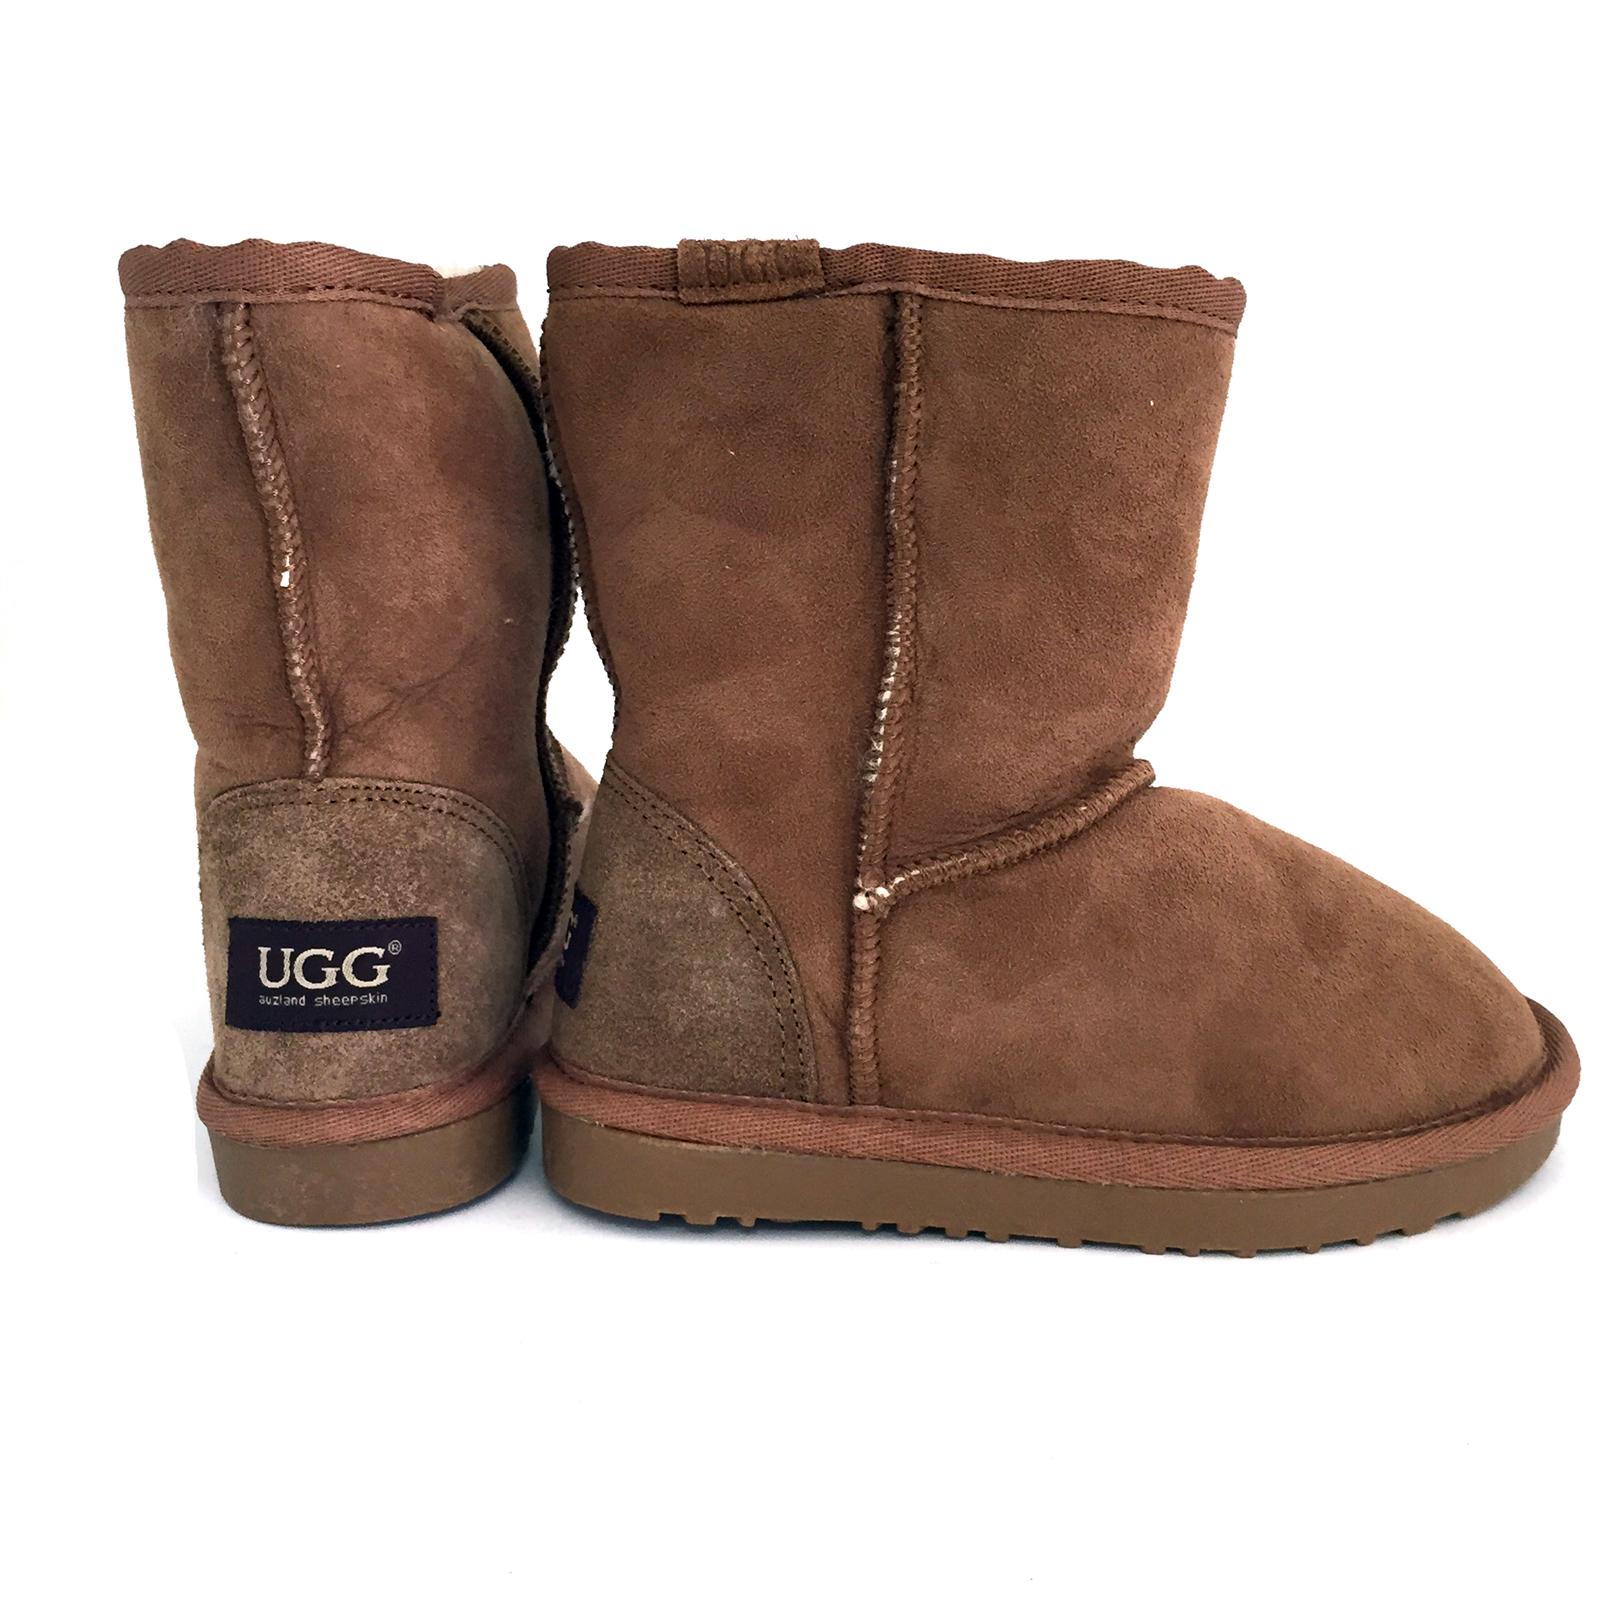 Auzland UGG Classic Kids Sheepskin Boots Chestnut